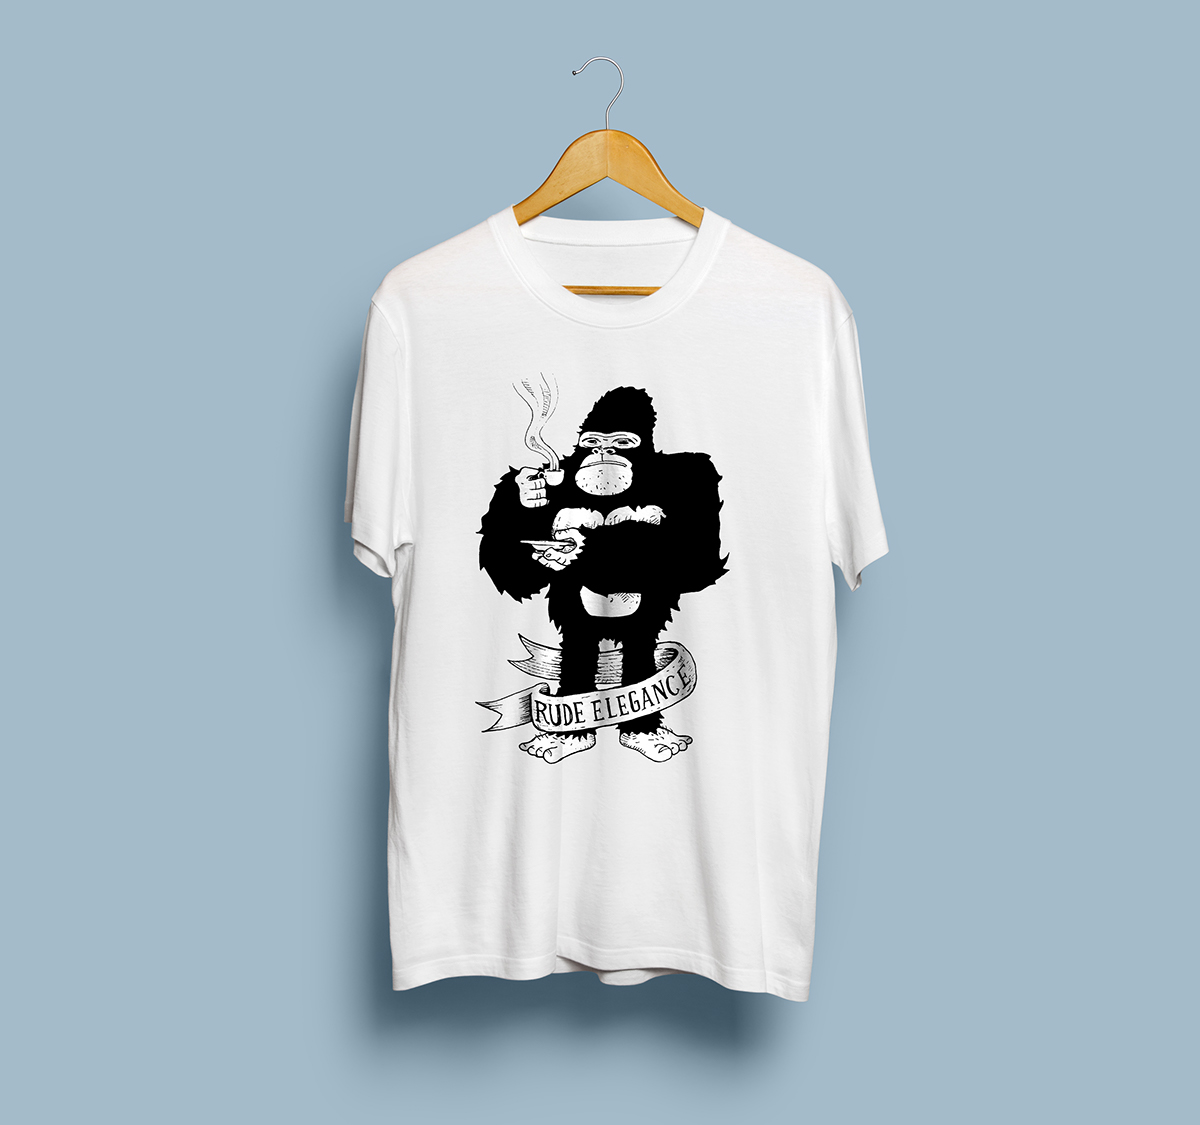 T Shirt Merchandise Project 38 Samples On Behance